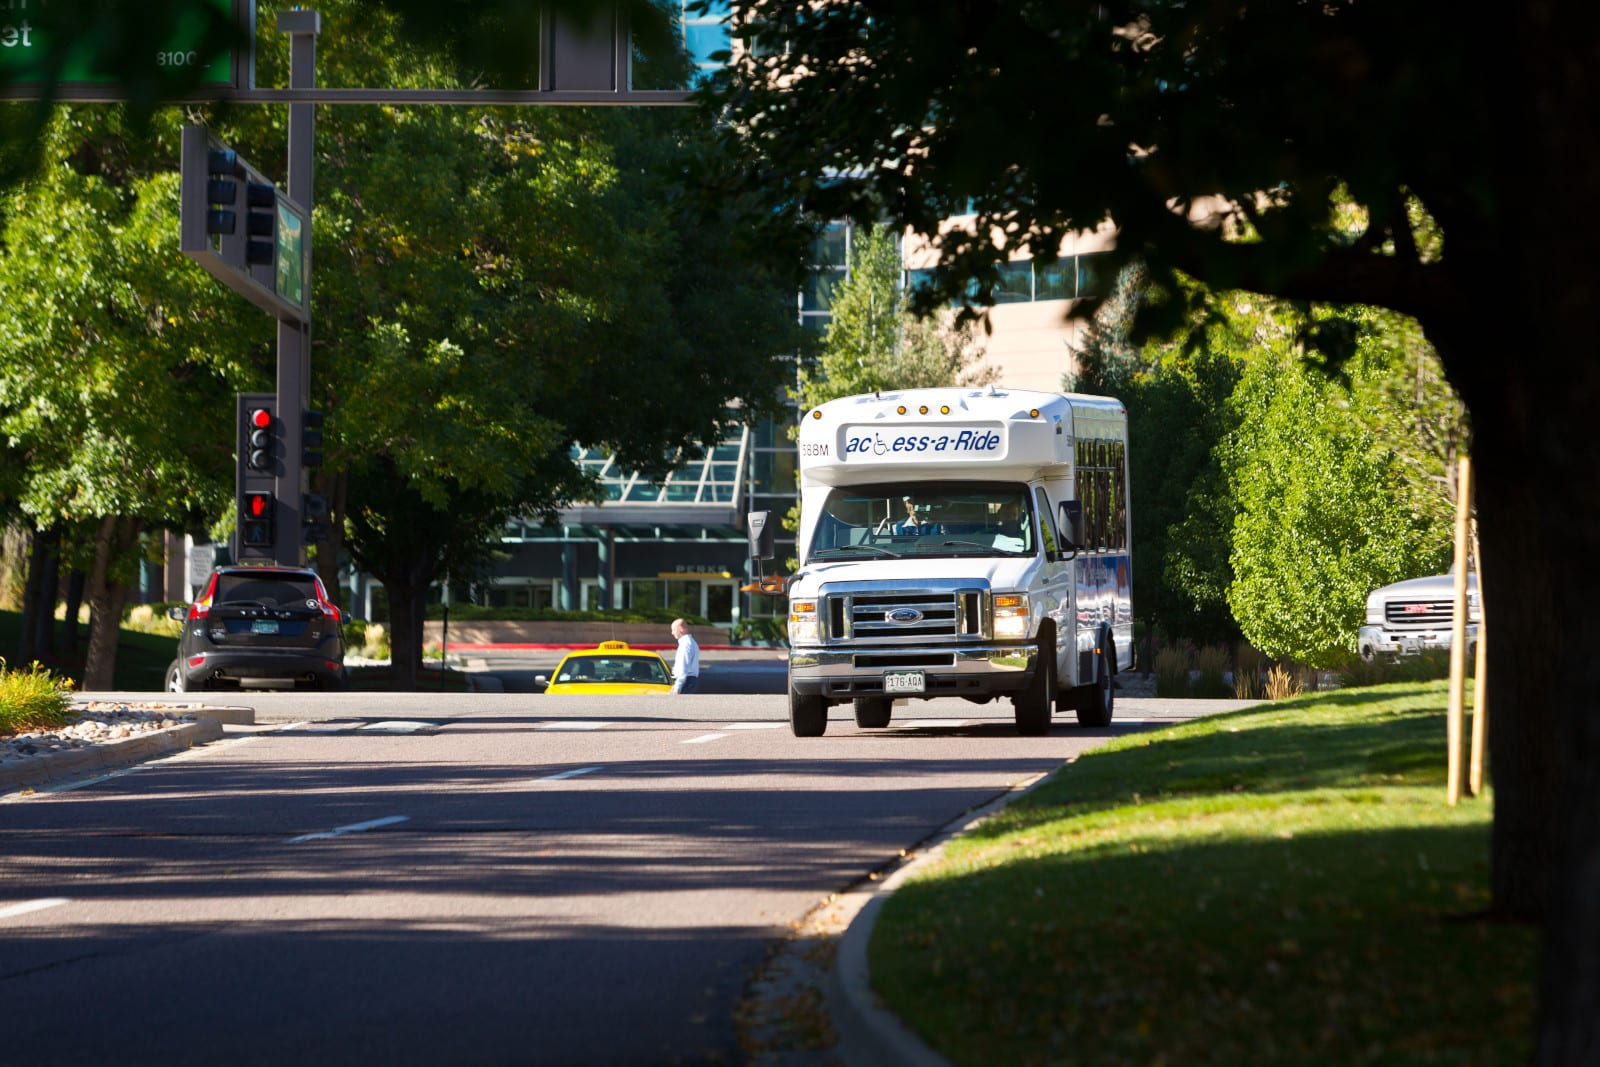 RTD Denver Access a Ride Shuttle